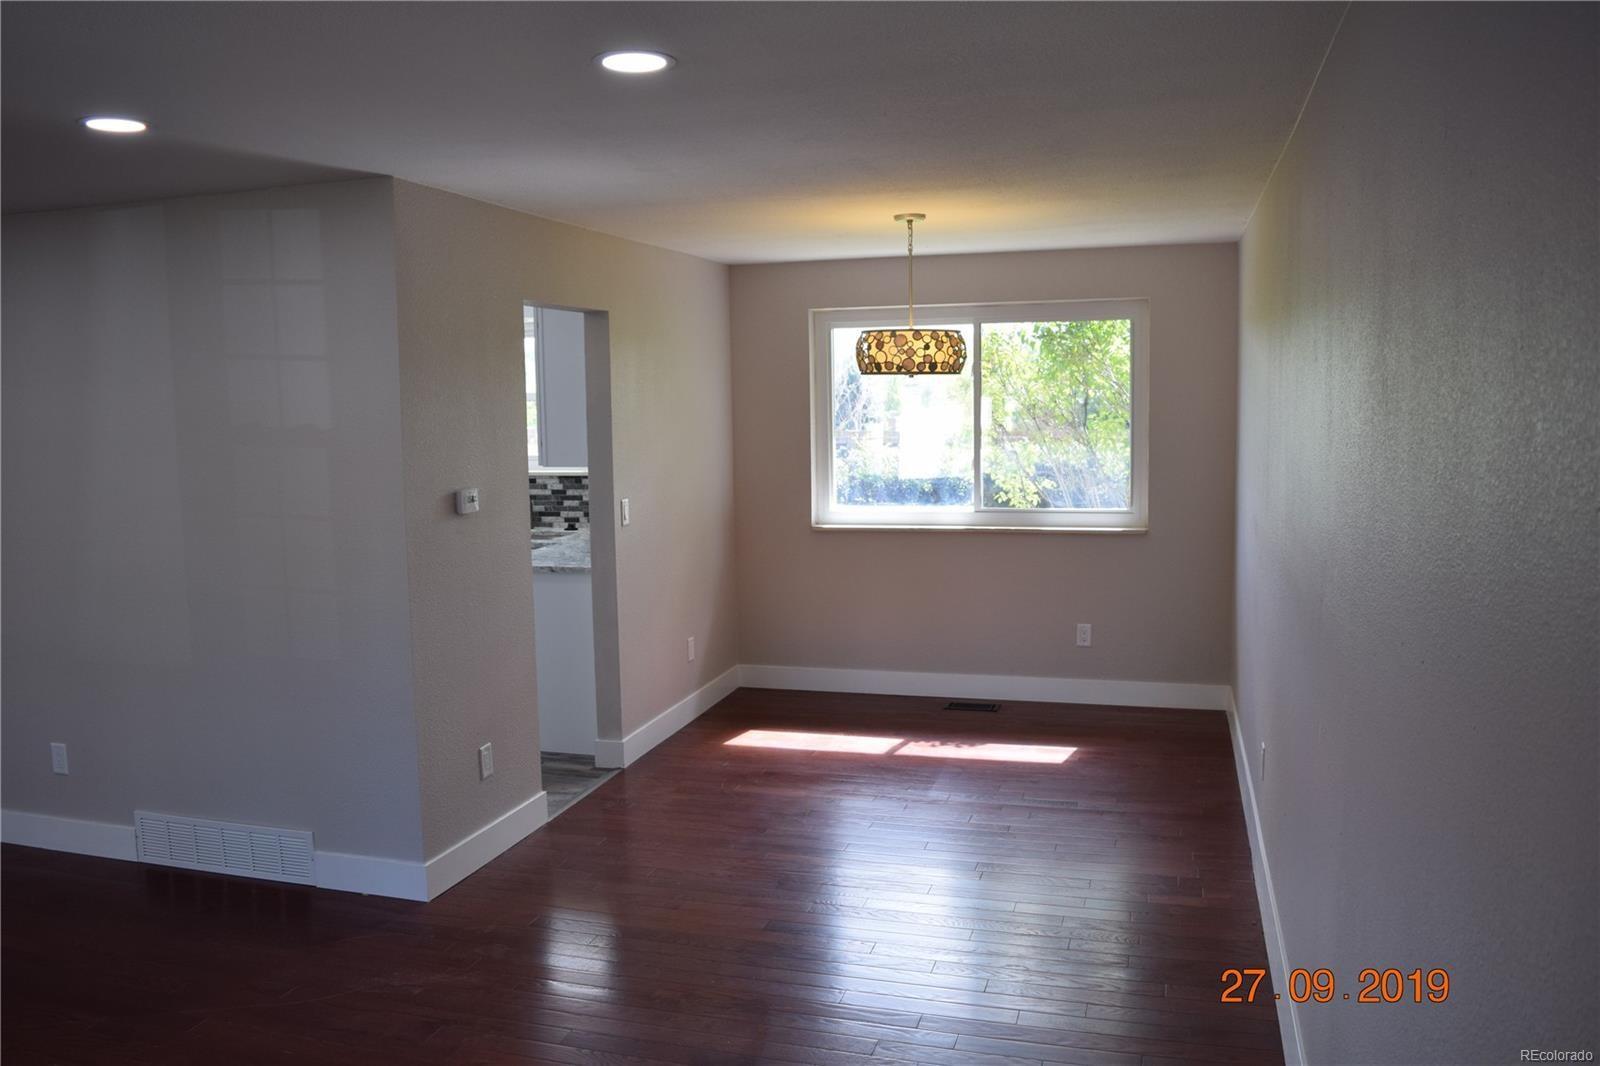 MLS# 9616472 - 8 - 8026 W Calhoun Place, Littleton, CO 80123